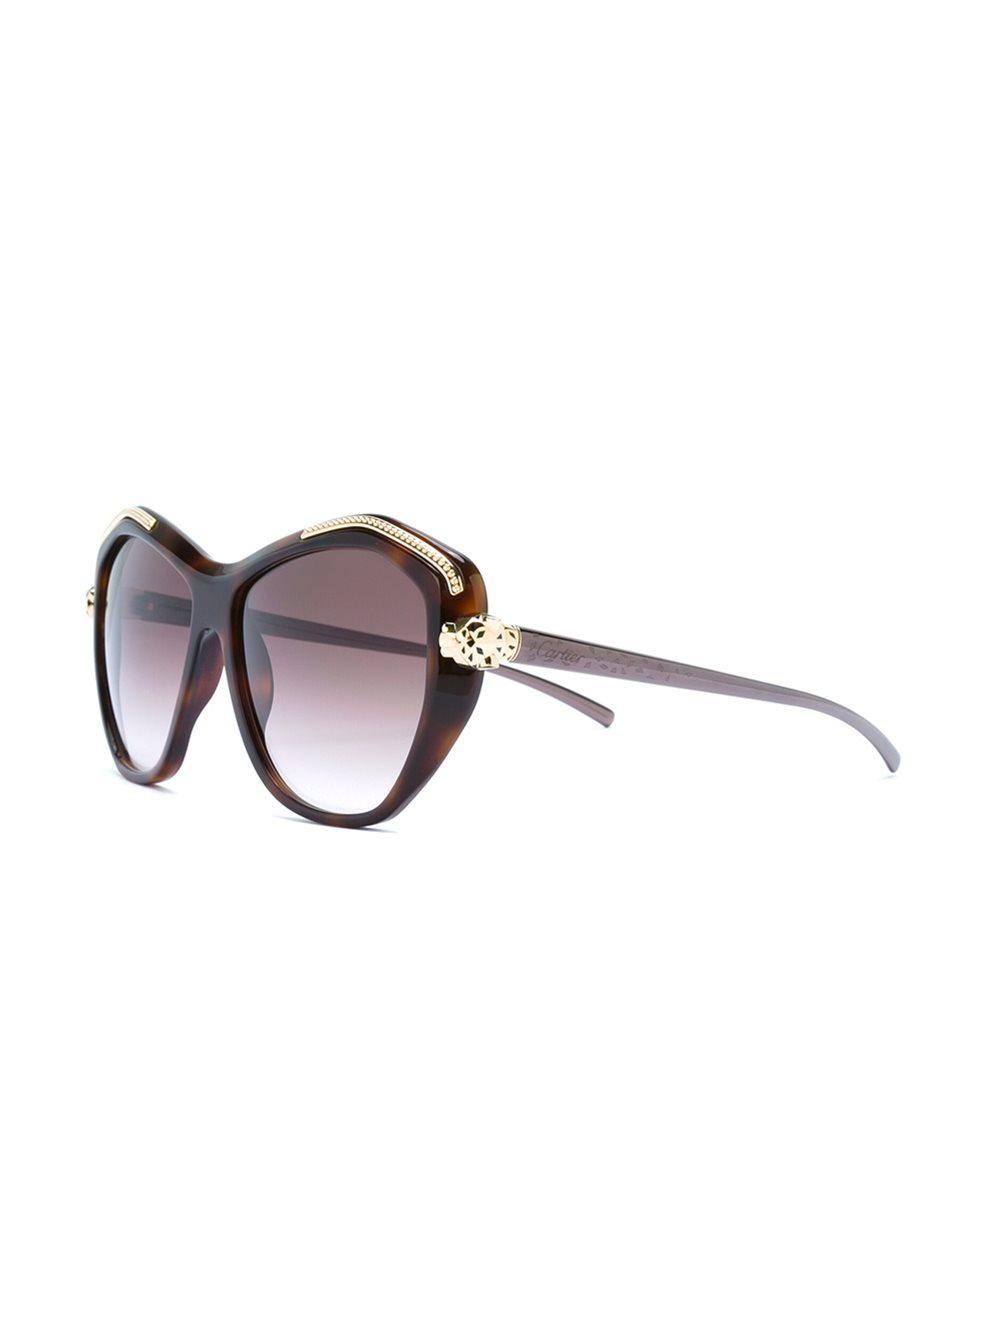 4c7c5221a7a9 Cartier  panthère Wild  Sunglasses in Brown - Lyst